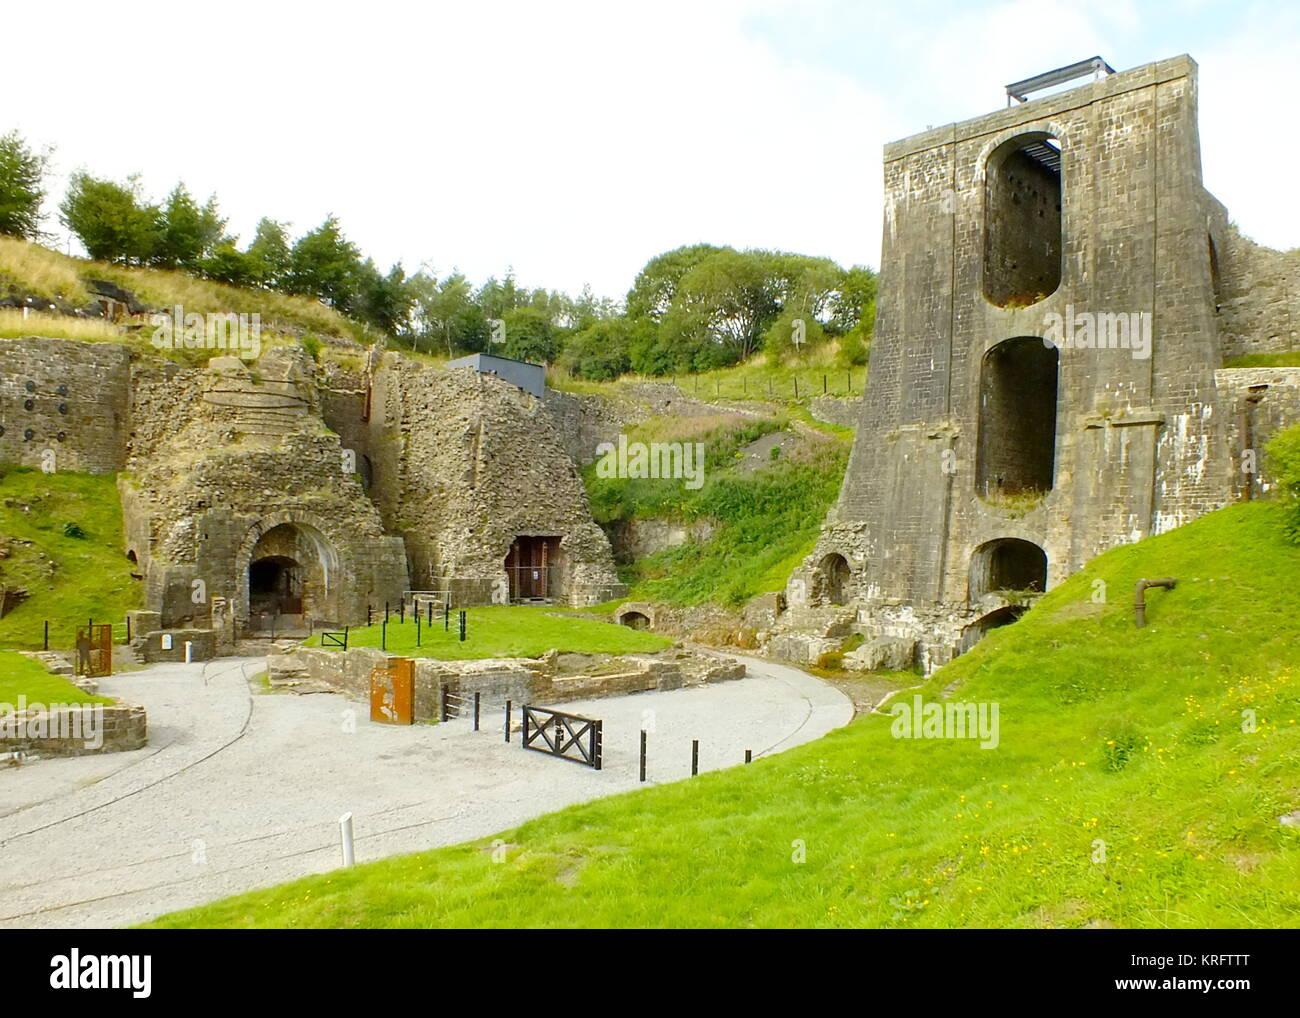 risalente Galles meridionale UK 12 settimana incontri nucale scansione